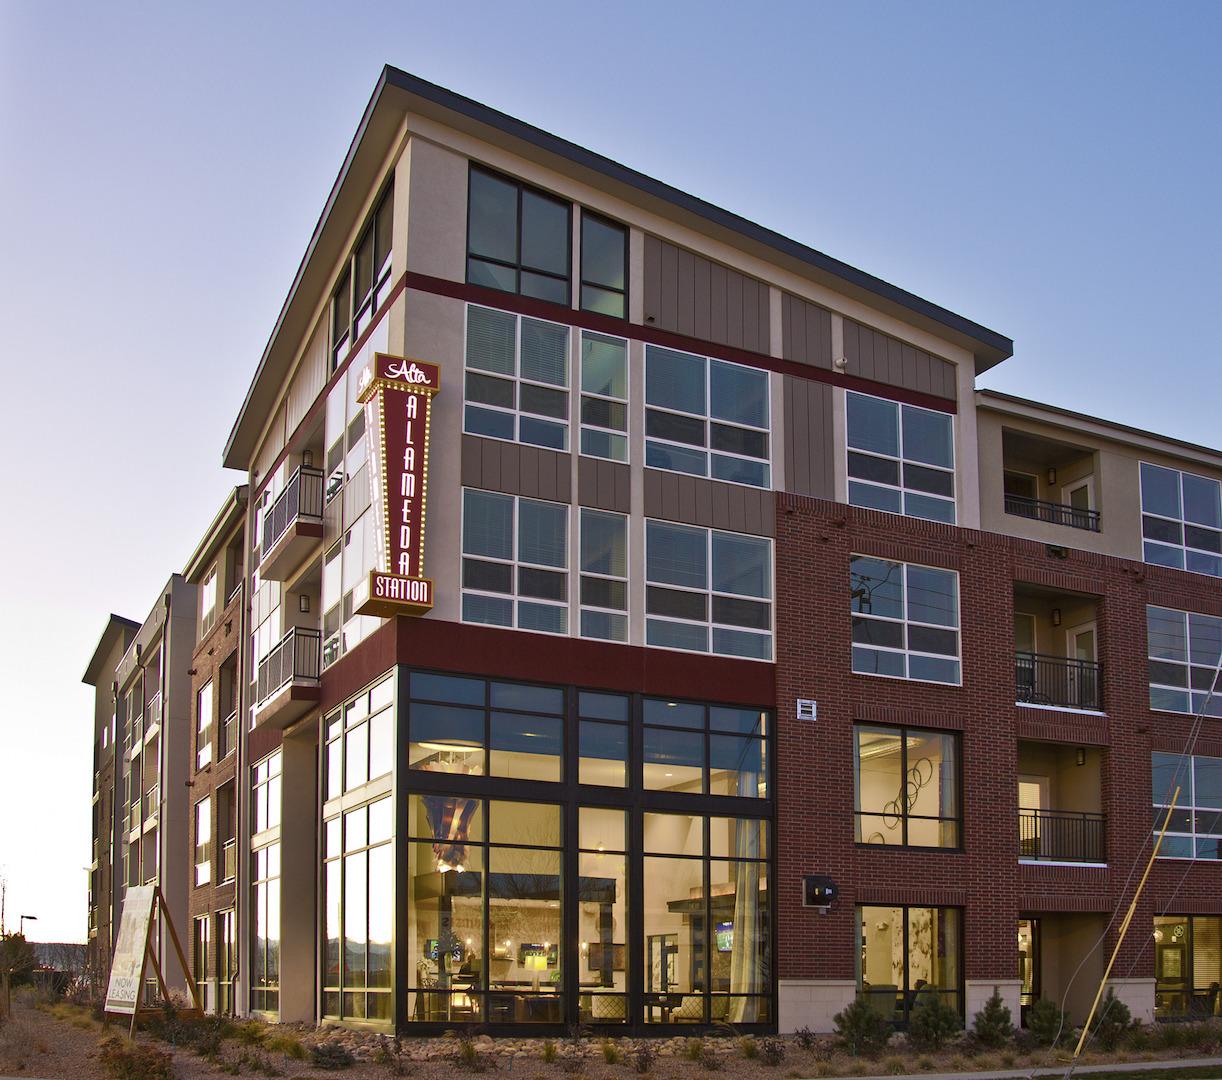 Furnished Apartments Near Georgia Tech: Alta Alameda Station